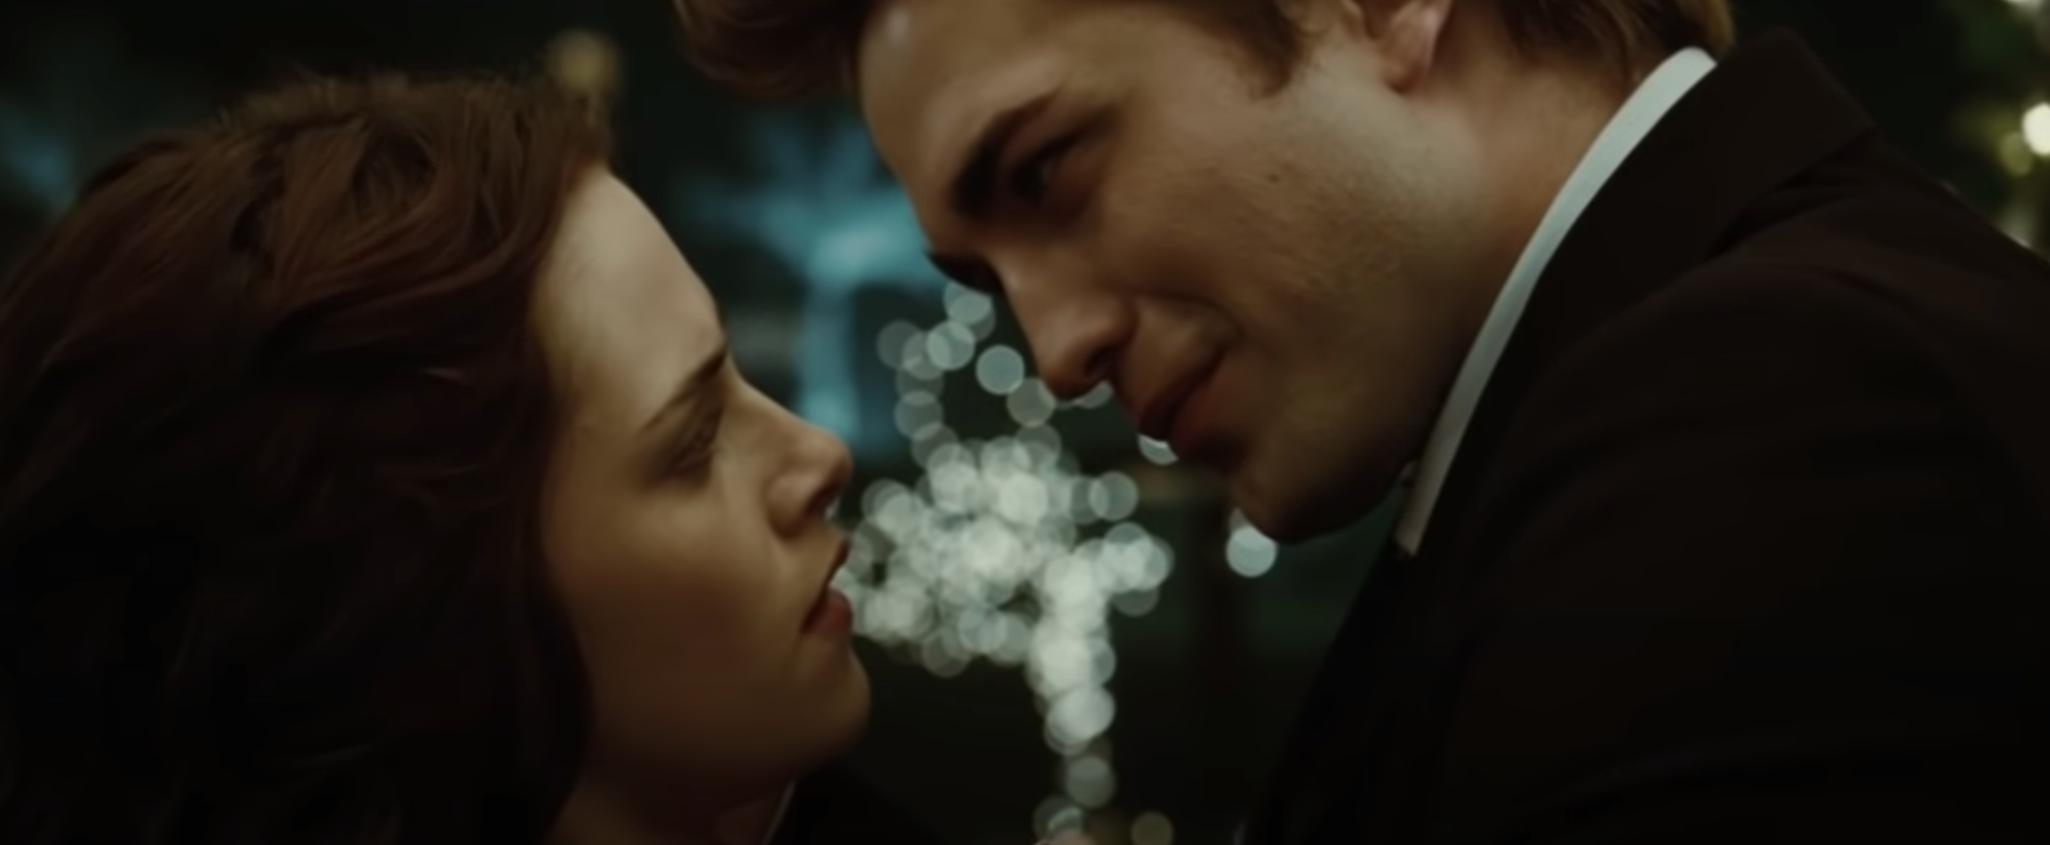 Bella Swan (Kristen Stewart) and Edward Cullen (Robert Pattinson) dancing at prom in 'Twilight.'